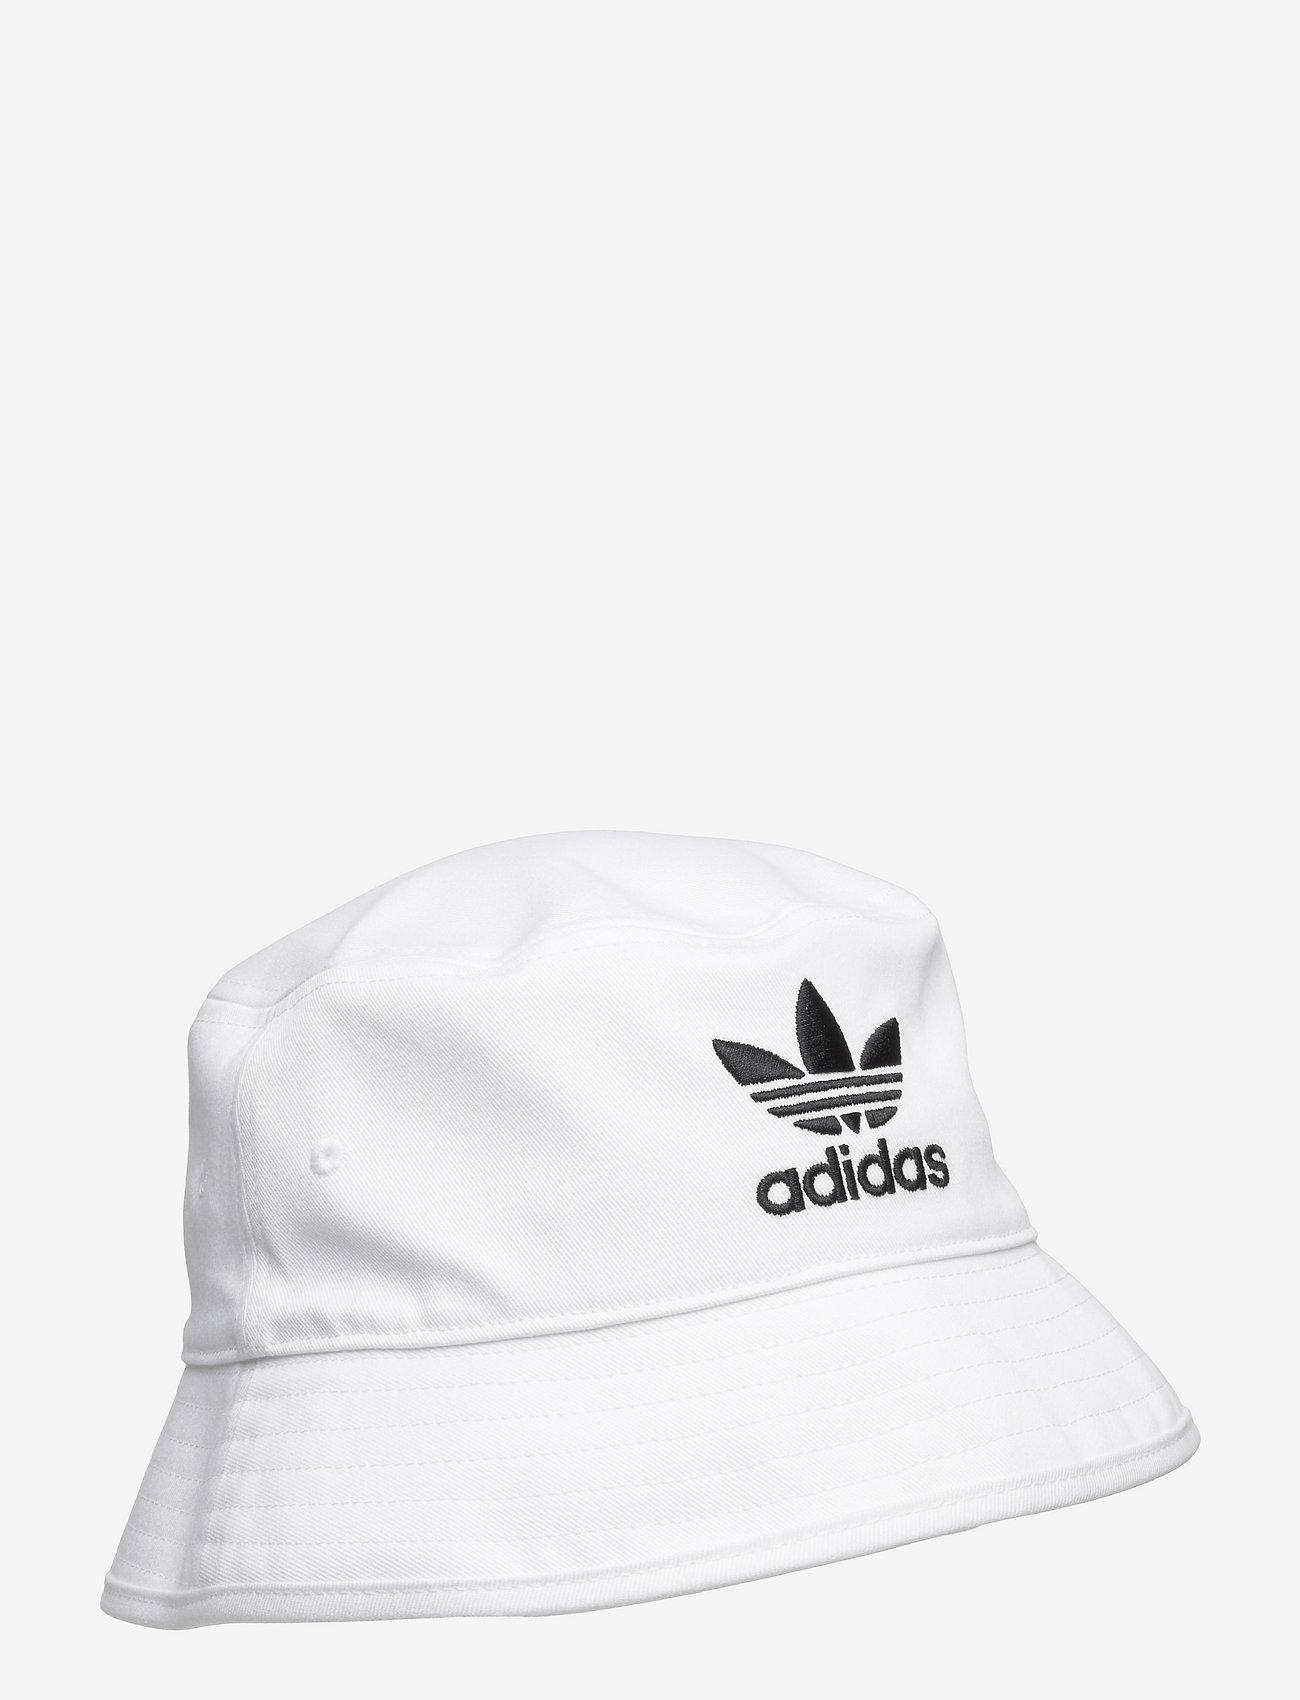 adidas Originals - Adicolor Trefoil Bucket Hat - bucket hats - white - 0